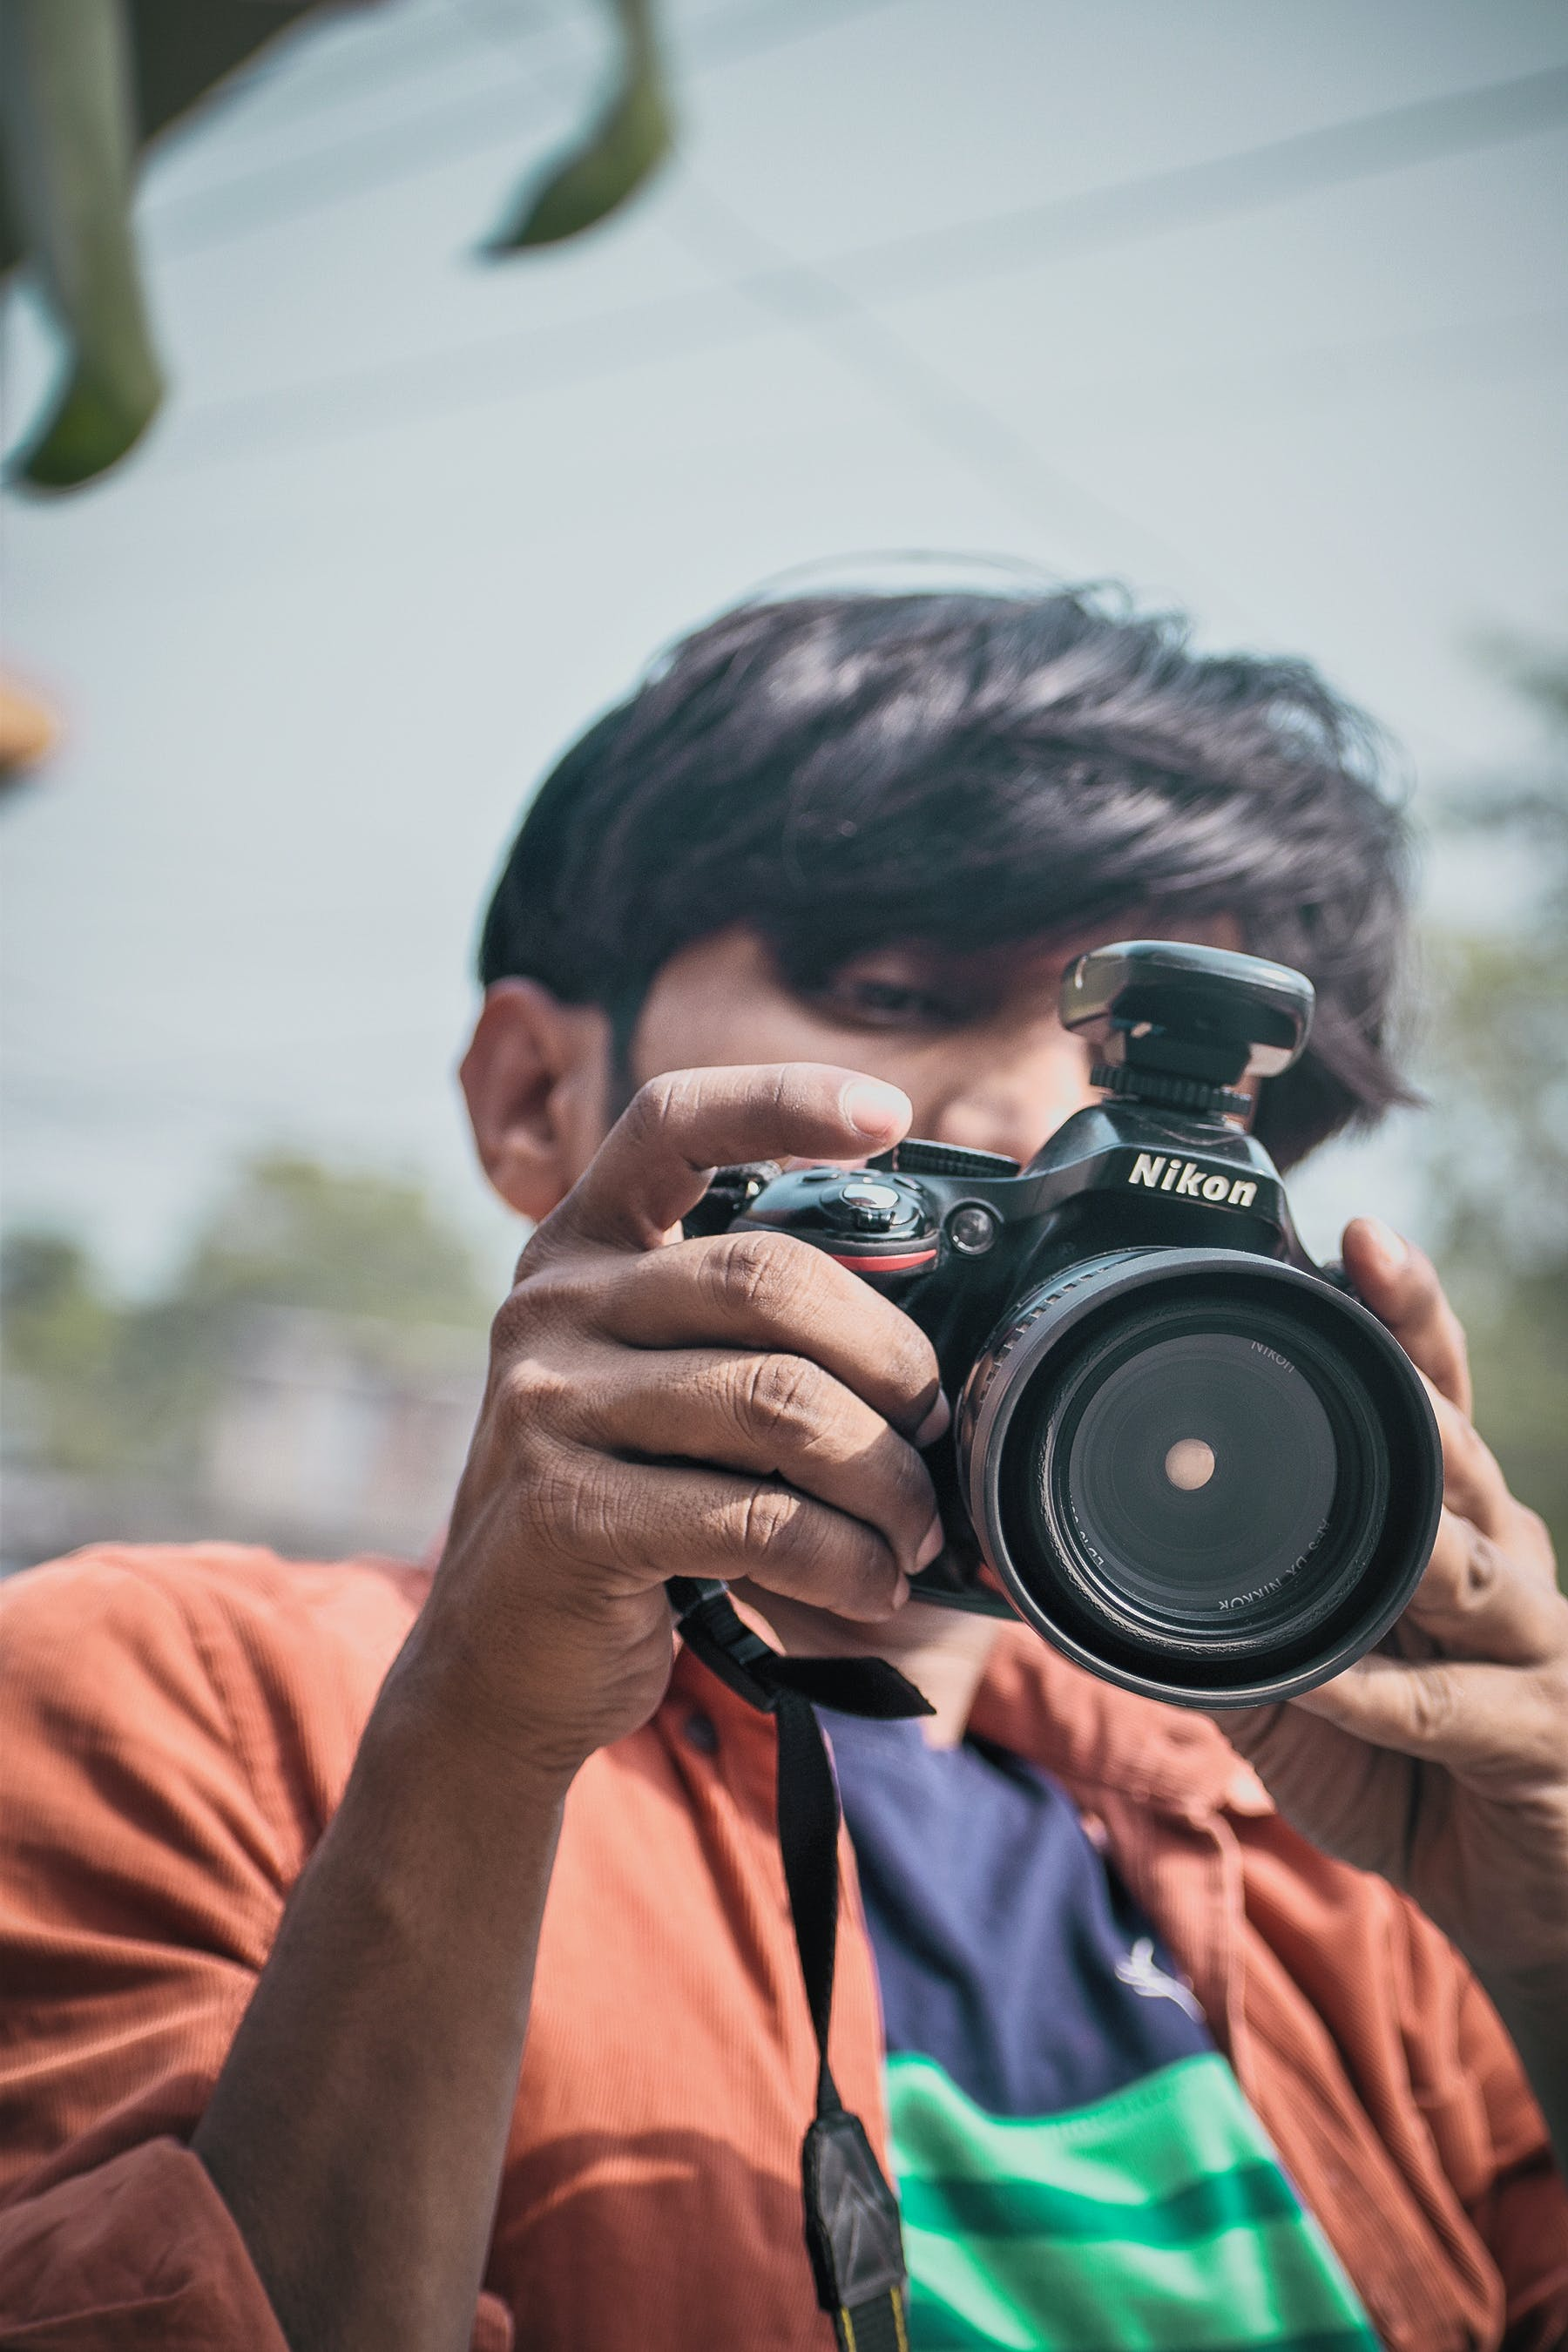 Free stock photo of adult, blur, camera, dslr camera